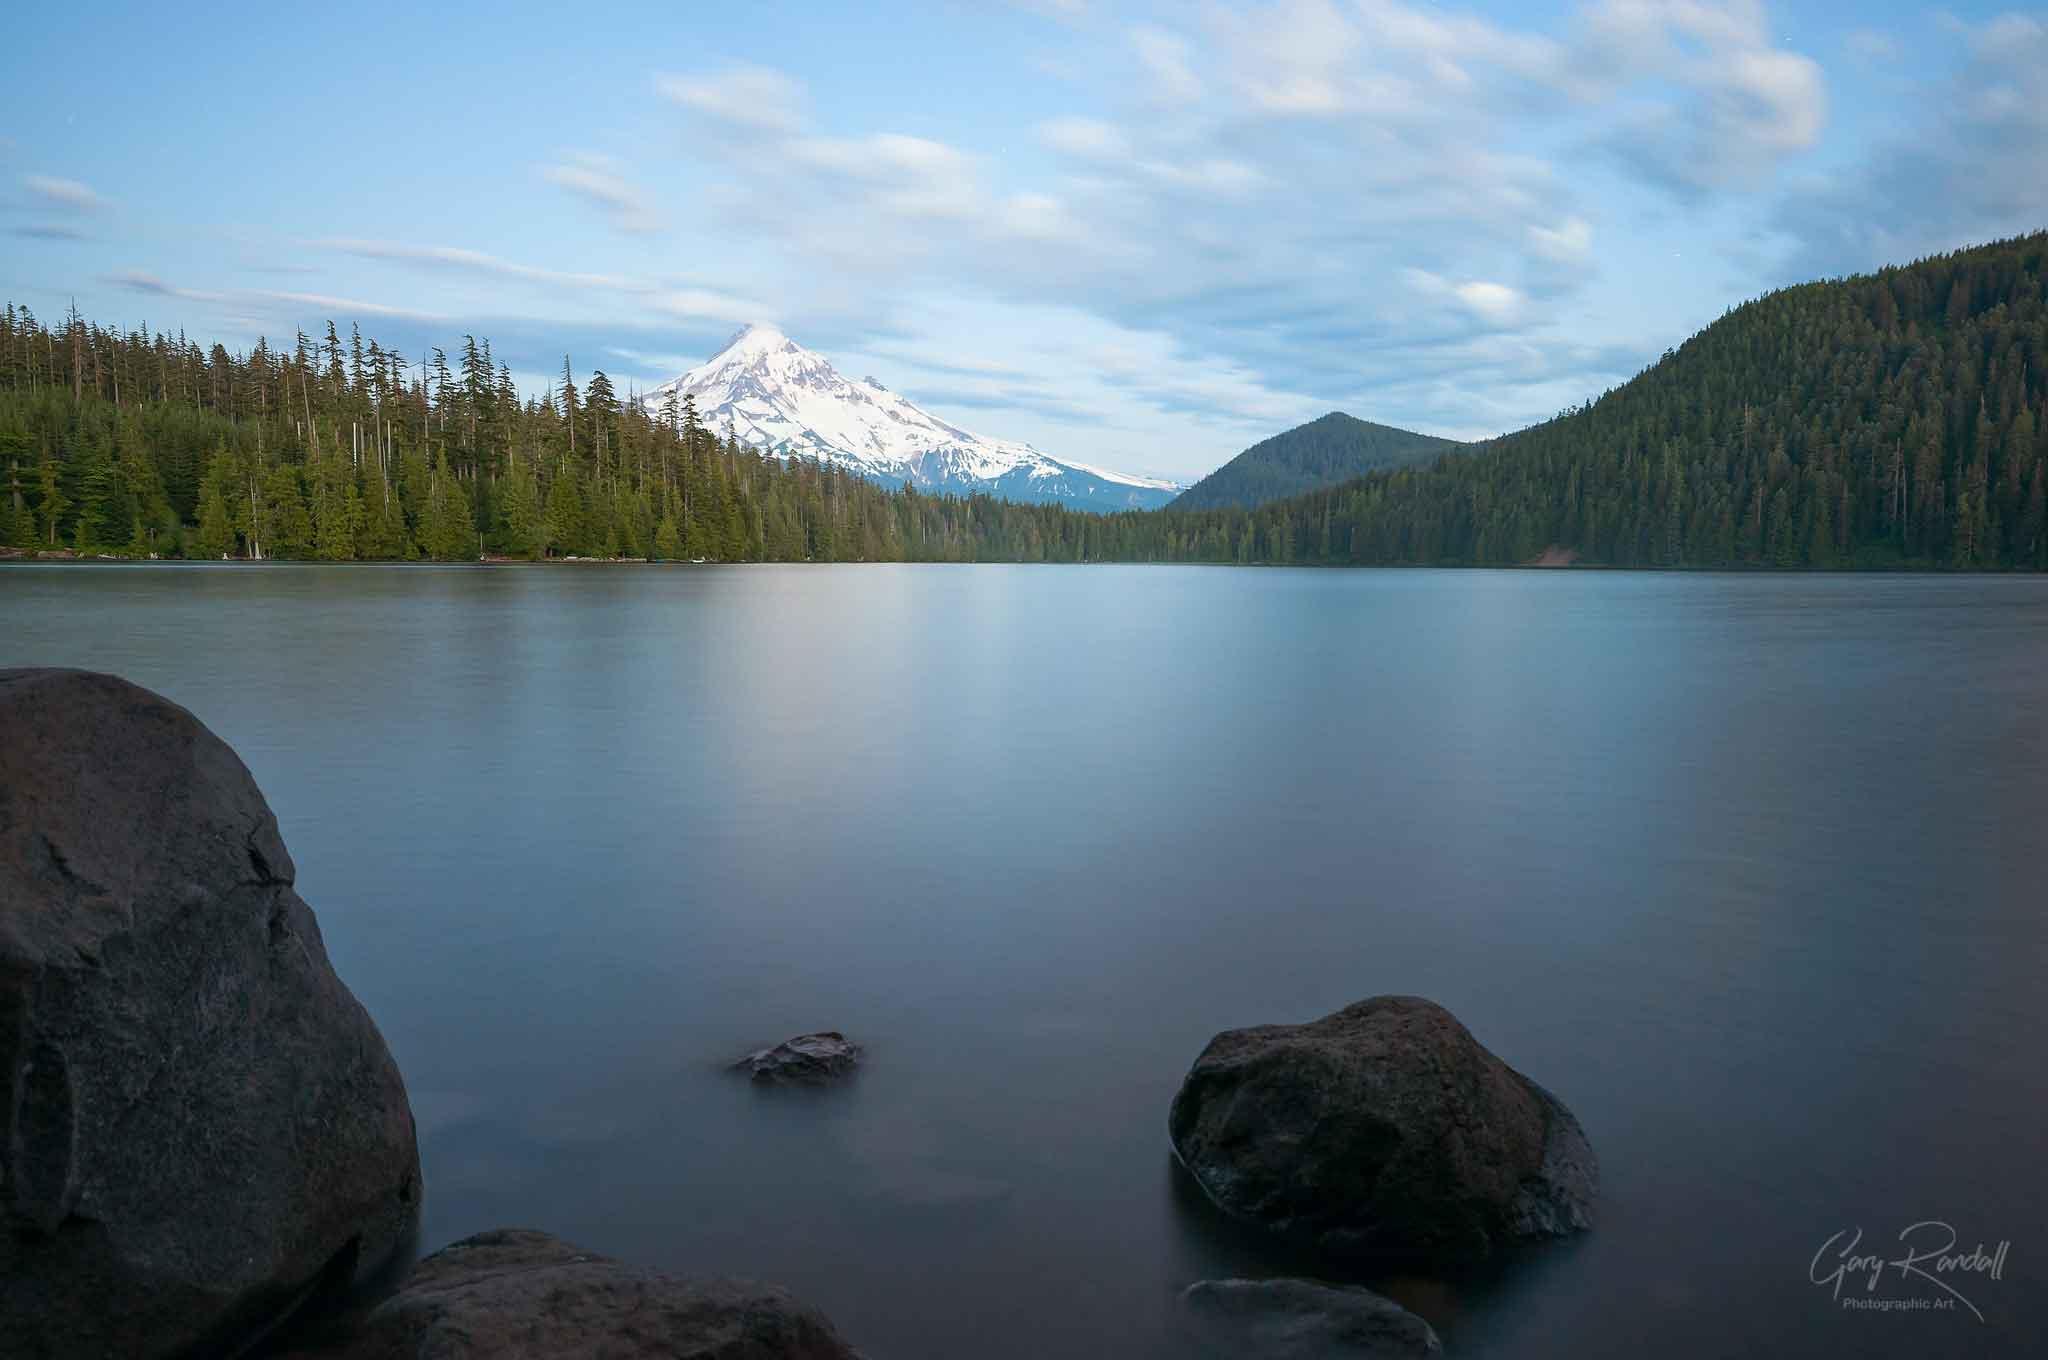 Mount Hood at Lost Lake Oregon